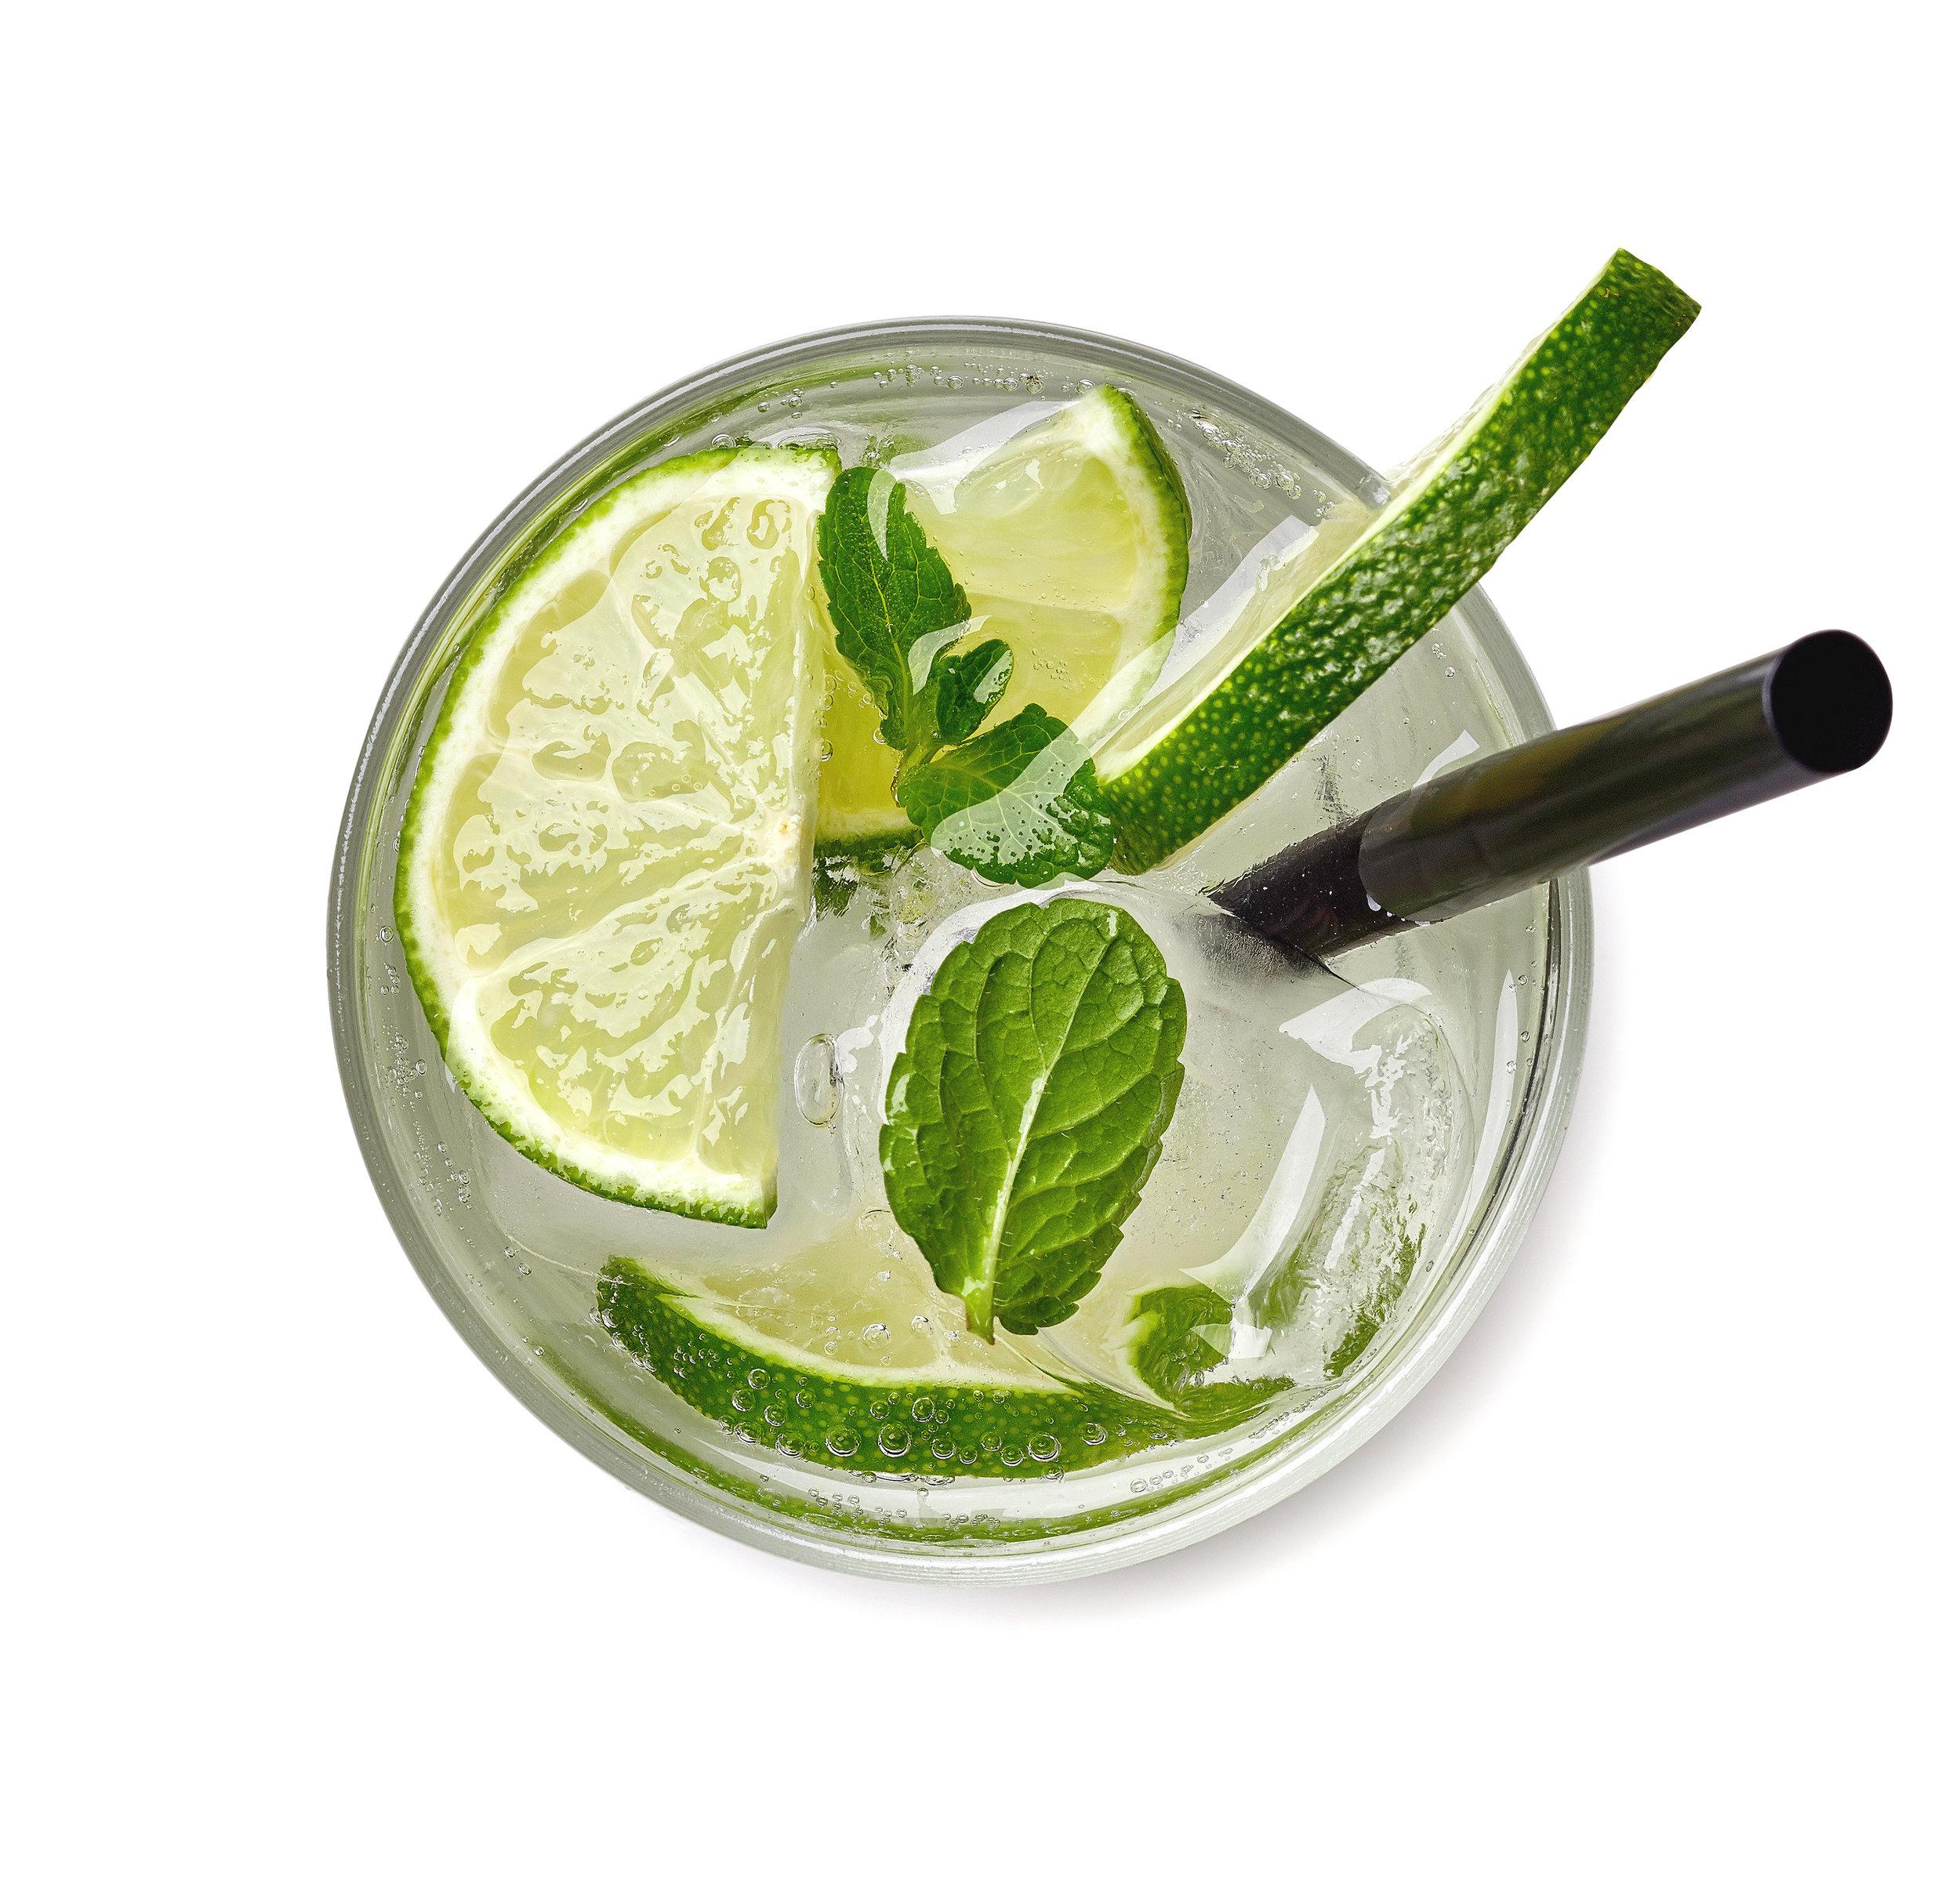 YV_Drink__0000_Yucajito.jpg